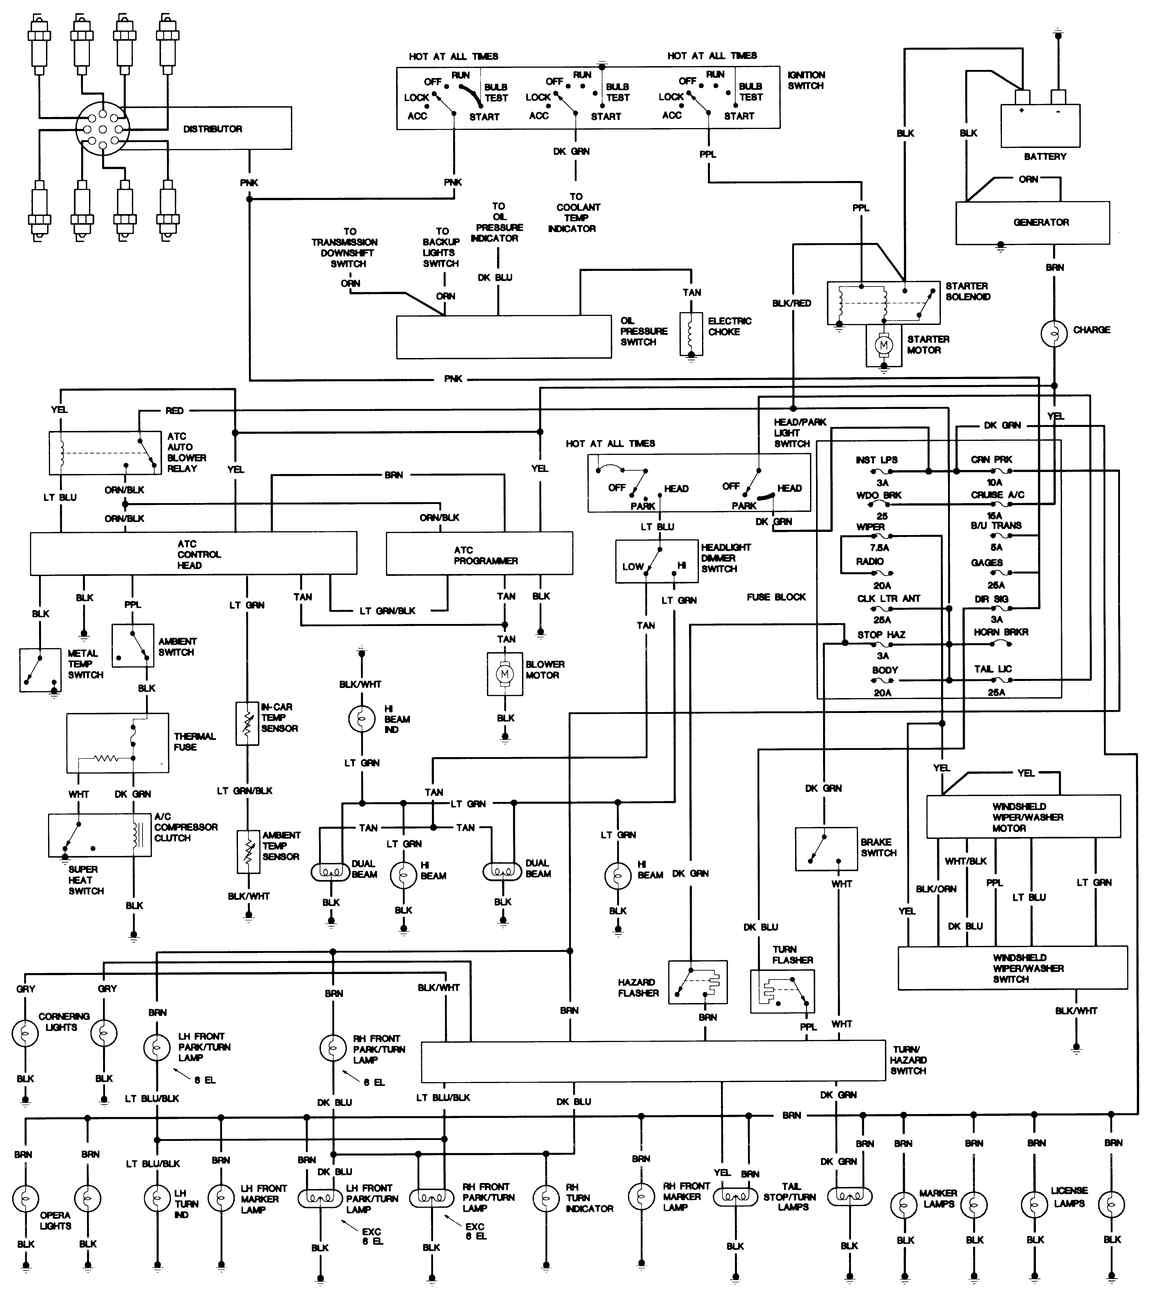 cadillac seville wiring wiring diagrams schematics cadillac cts 2003 vacuum hose diagram 2000 cadillac deville ignition wiring diagram 2000 cadillac deville 1978 cadillac seville cadillac cts v